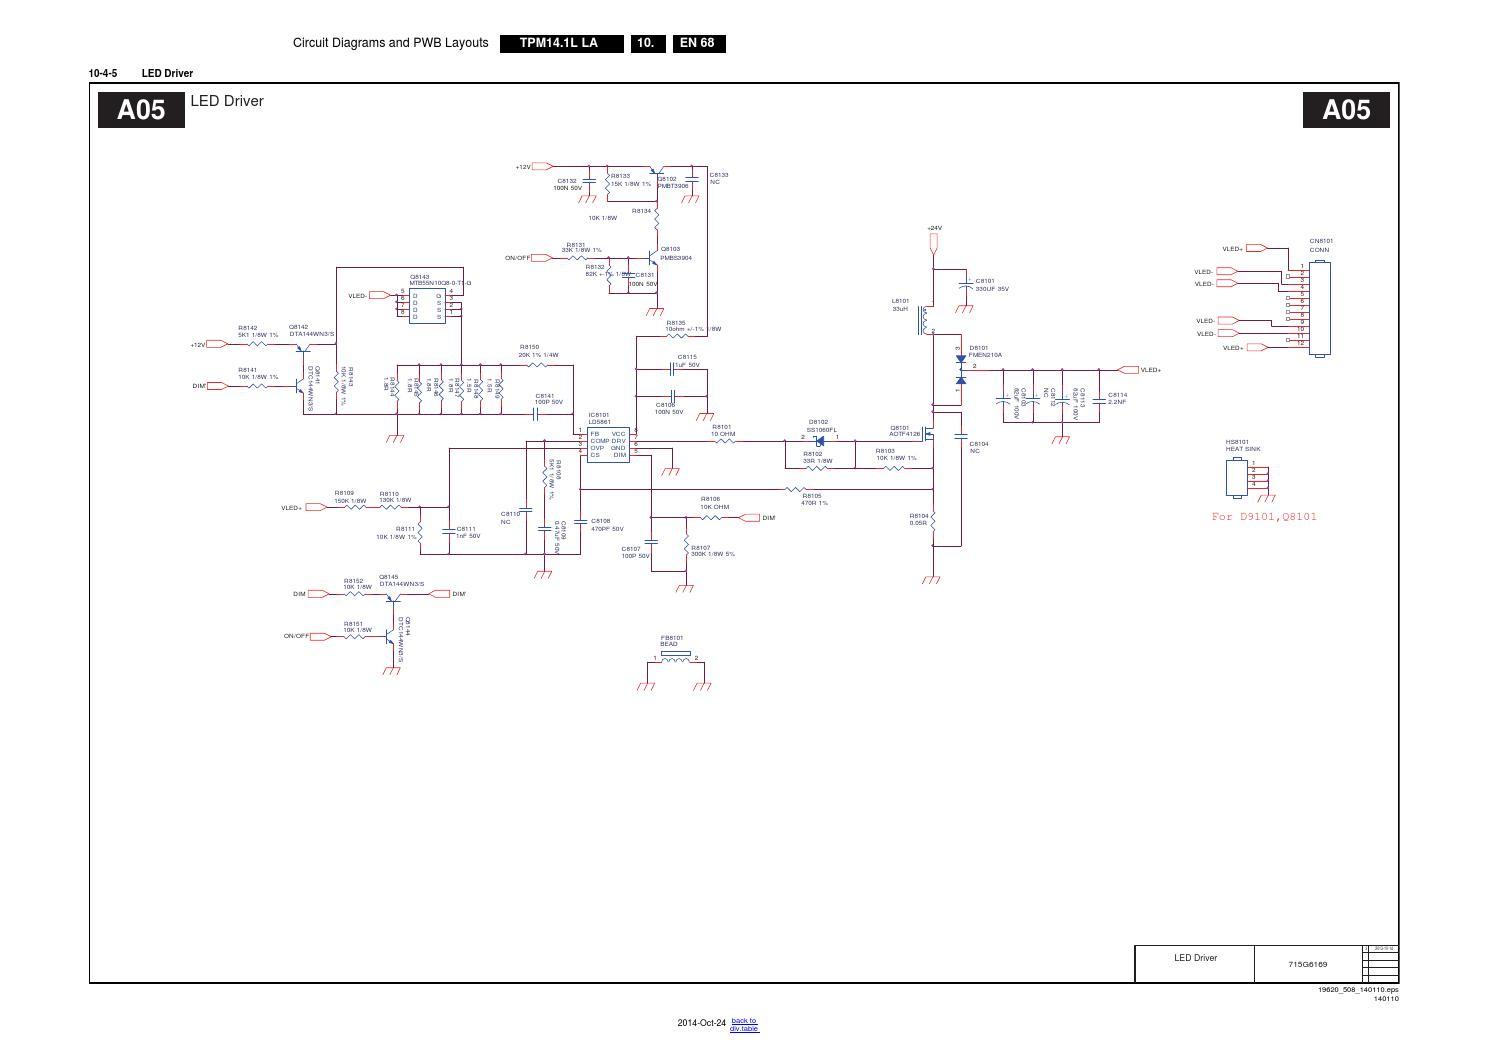 Manual de serviço televisor PHILIPS com o chassis TPM14.1L